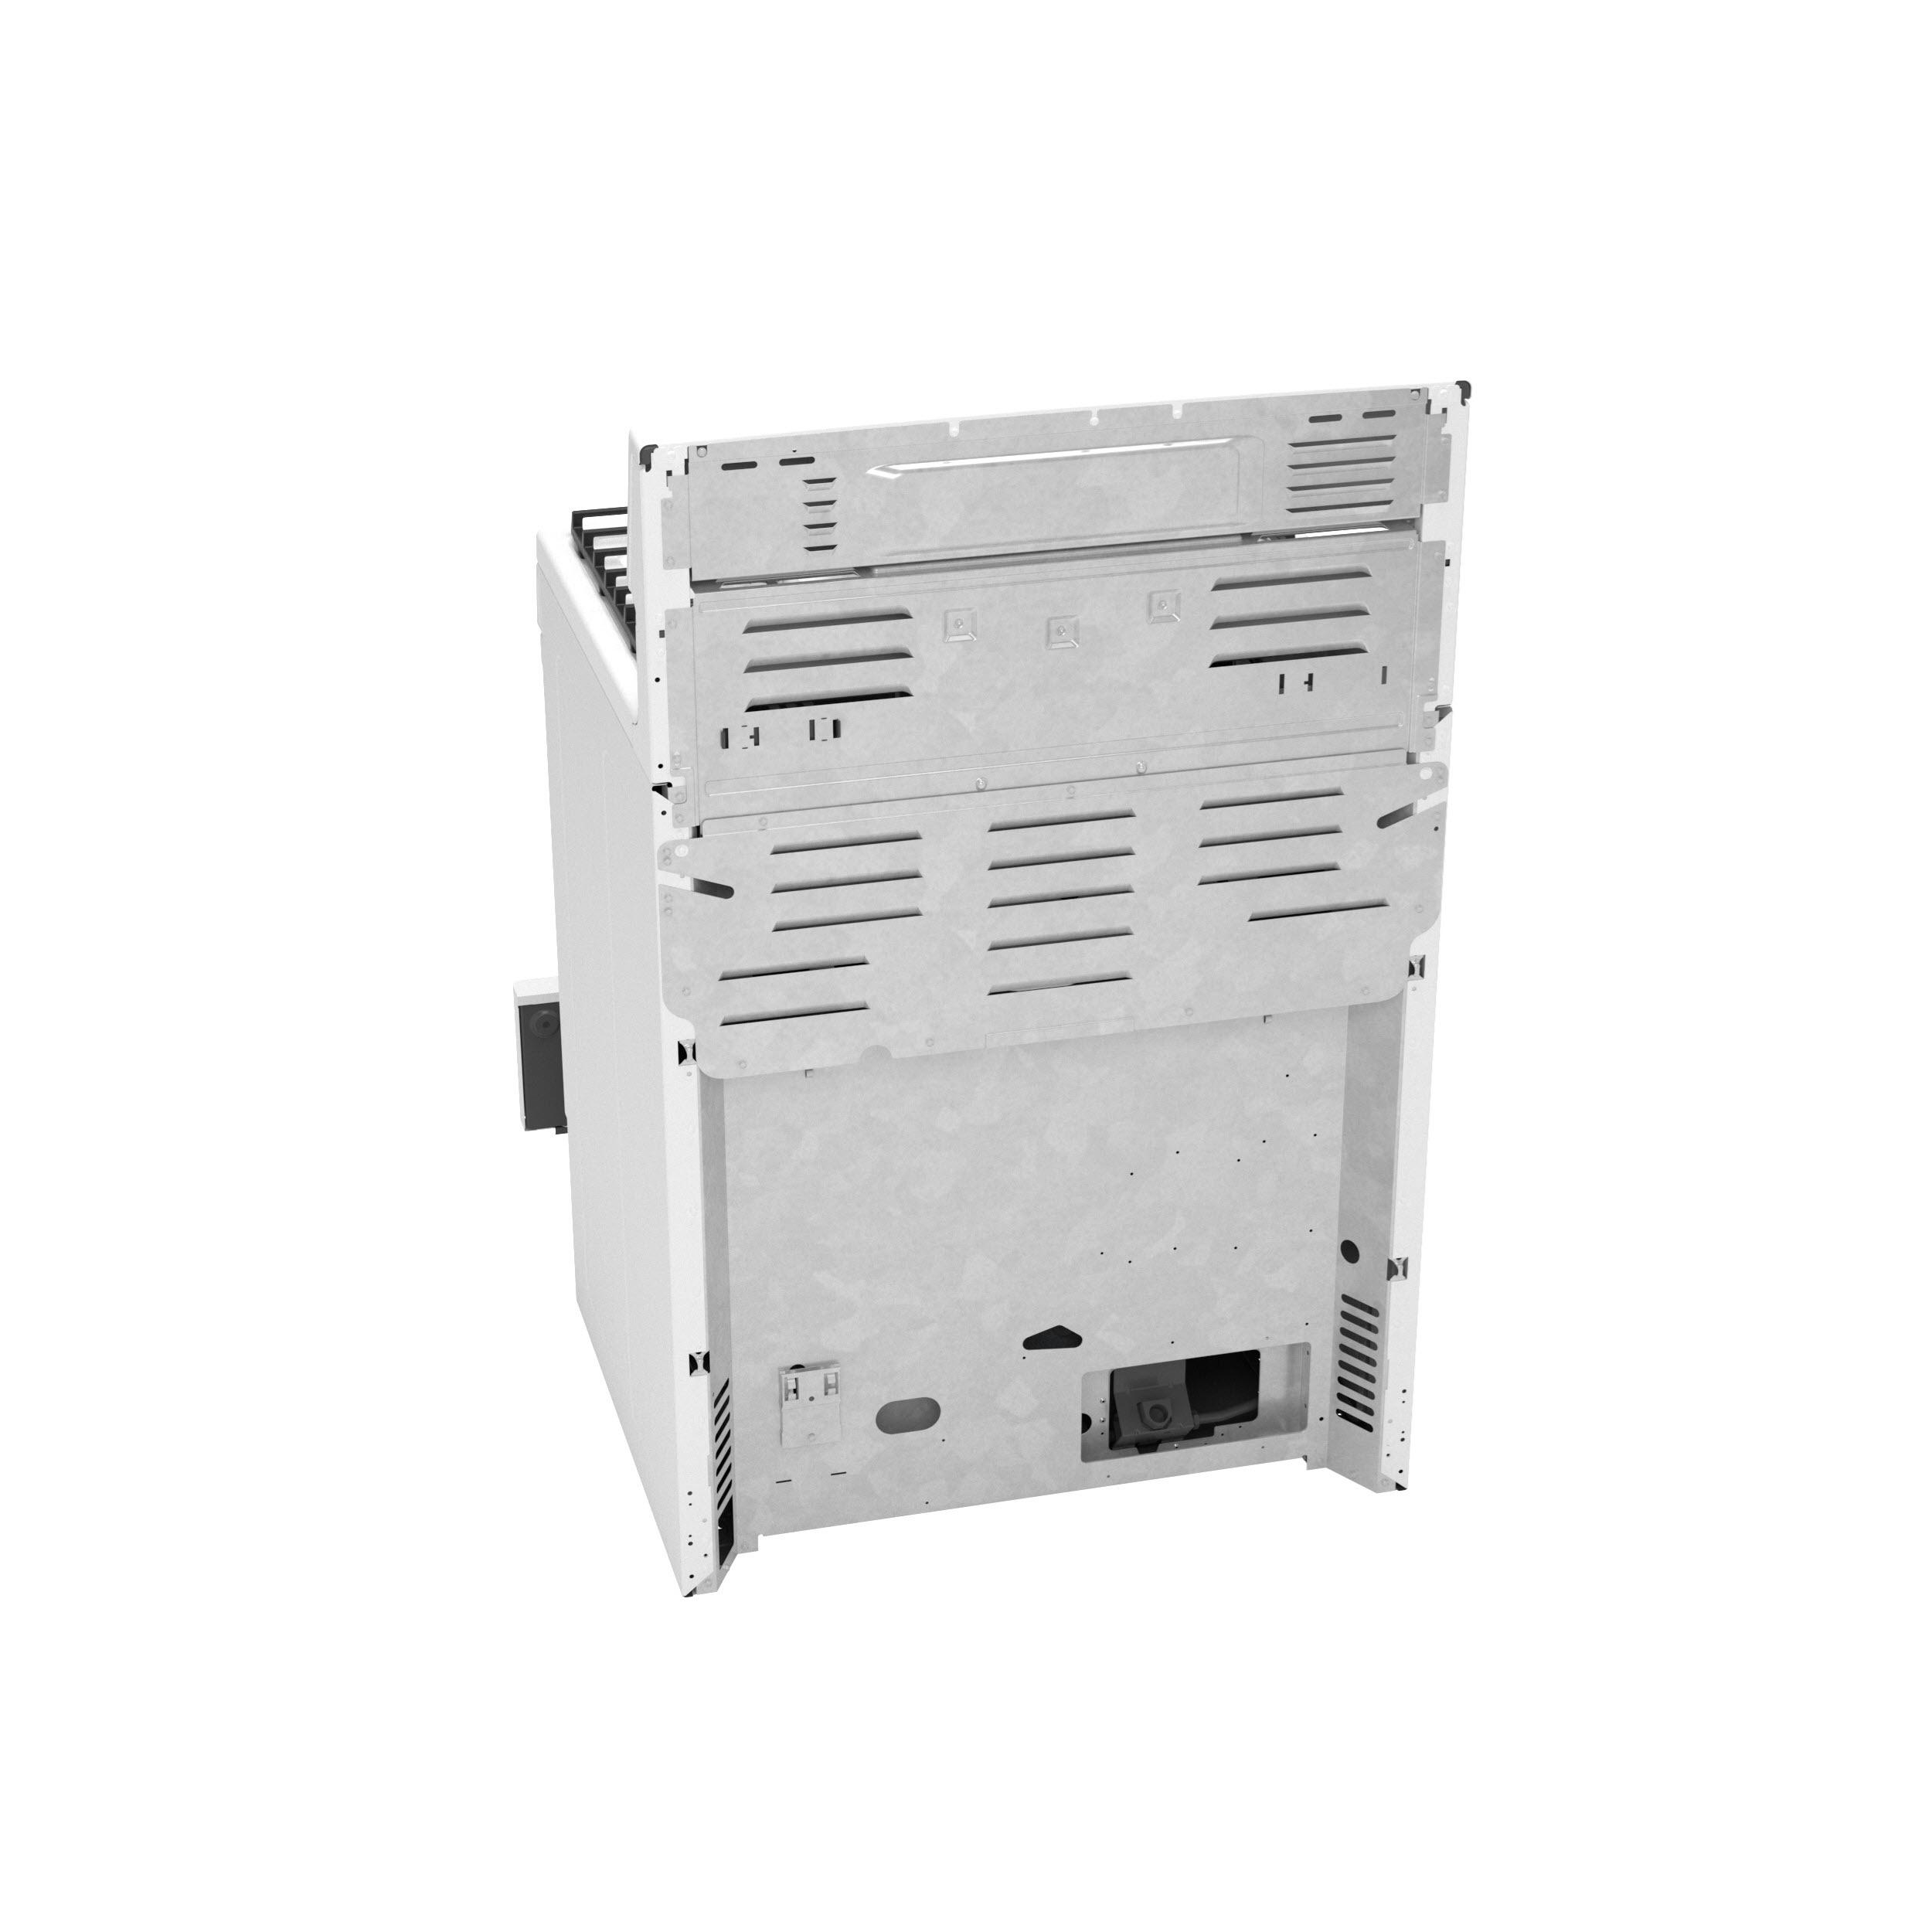 "Model: JGBS61DPWW | GE GE® 30"" Free-Standing Gas Range"